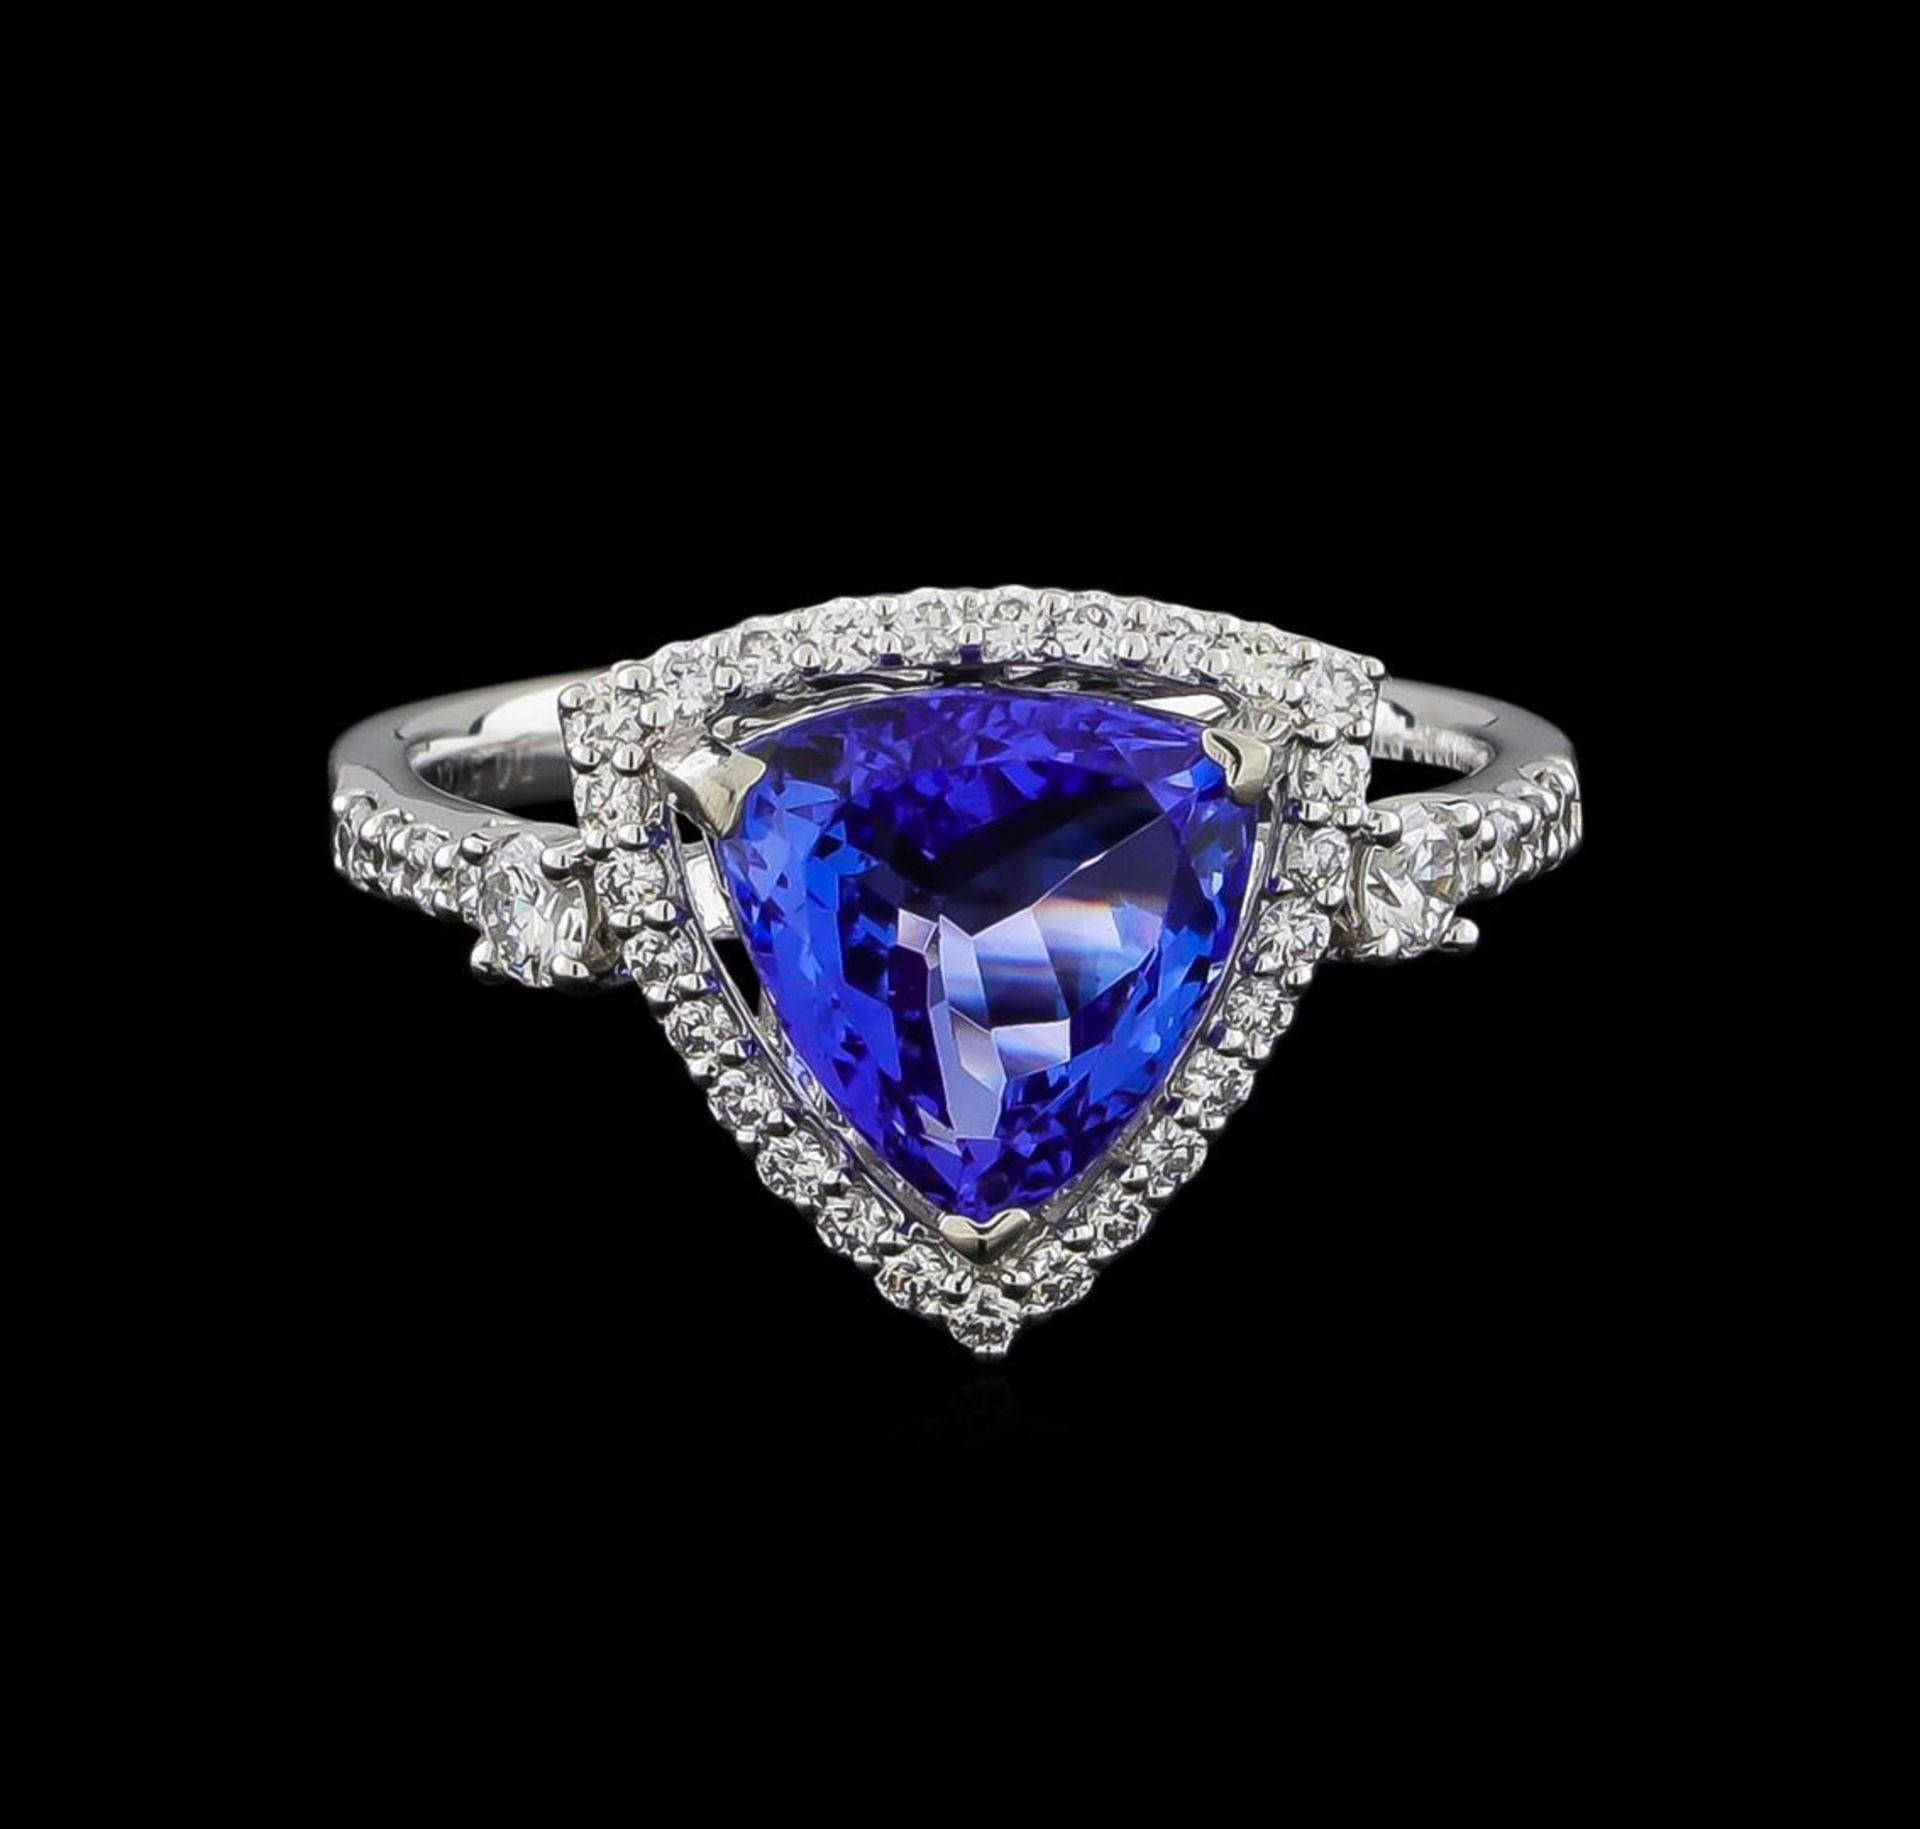 2.46 ctw Tanzanite and Diamond Ring - Platinum - Image 2 of 5